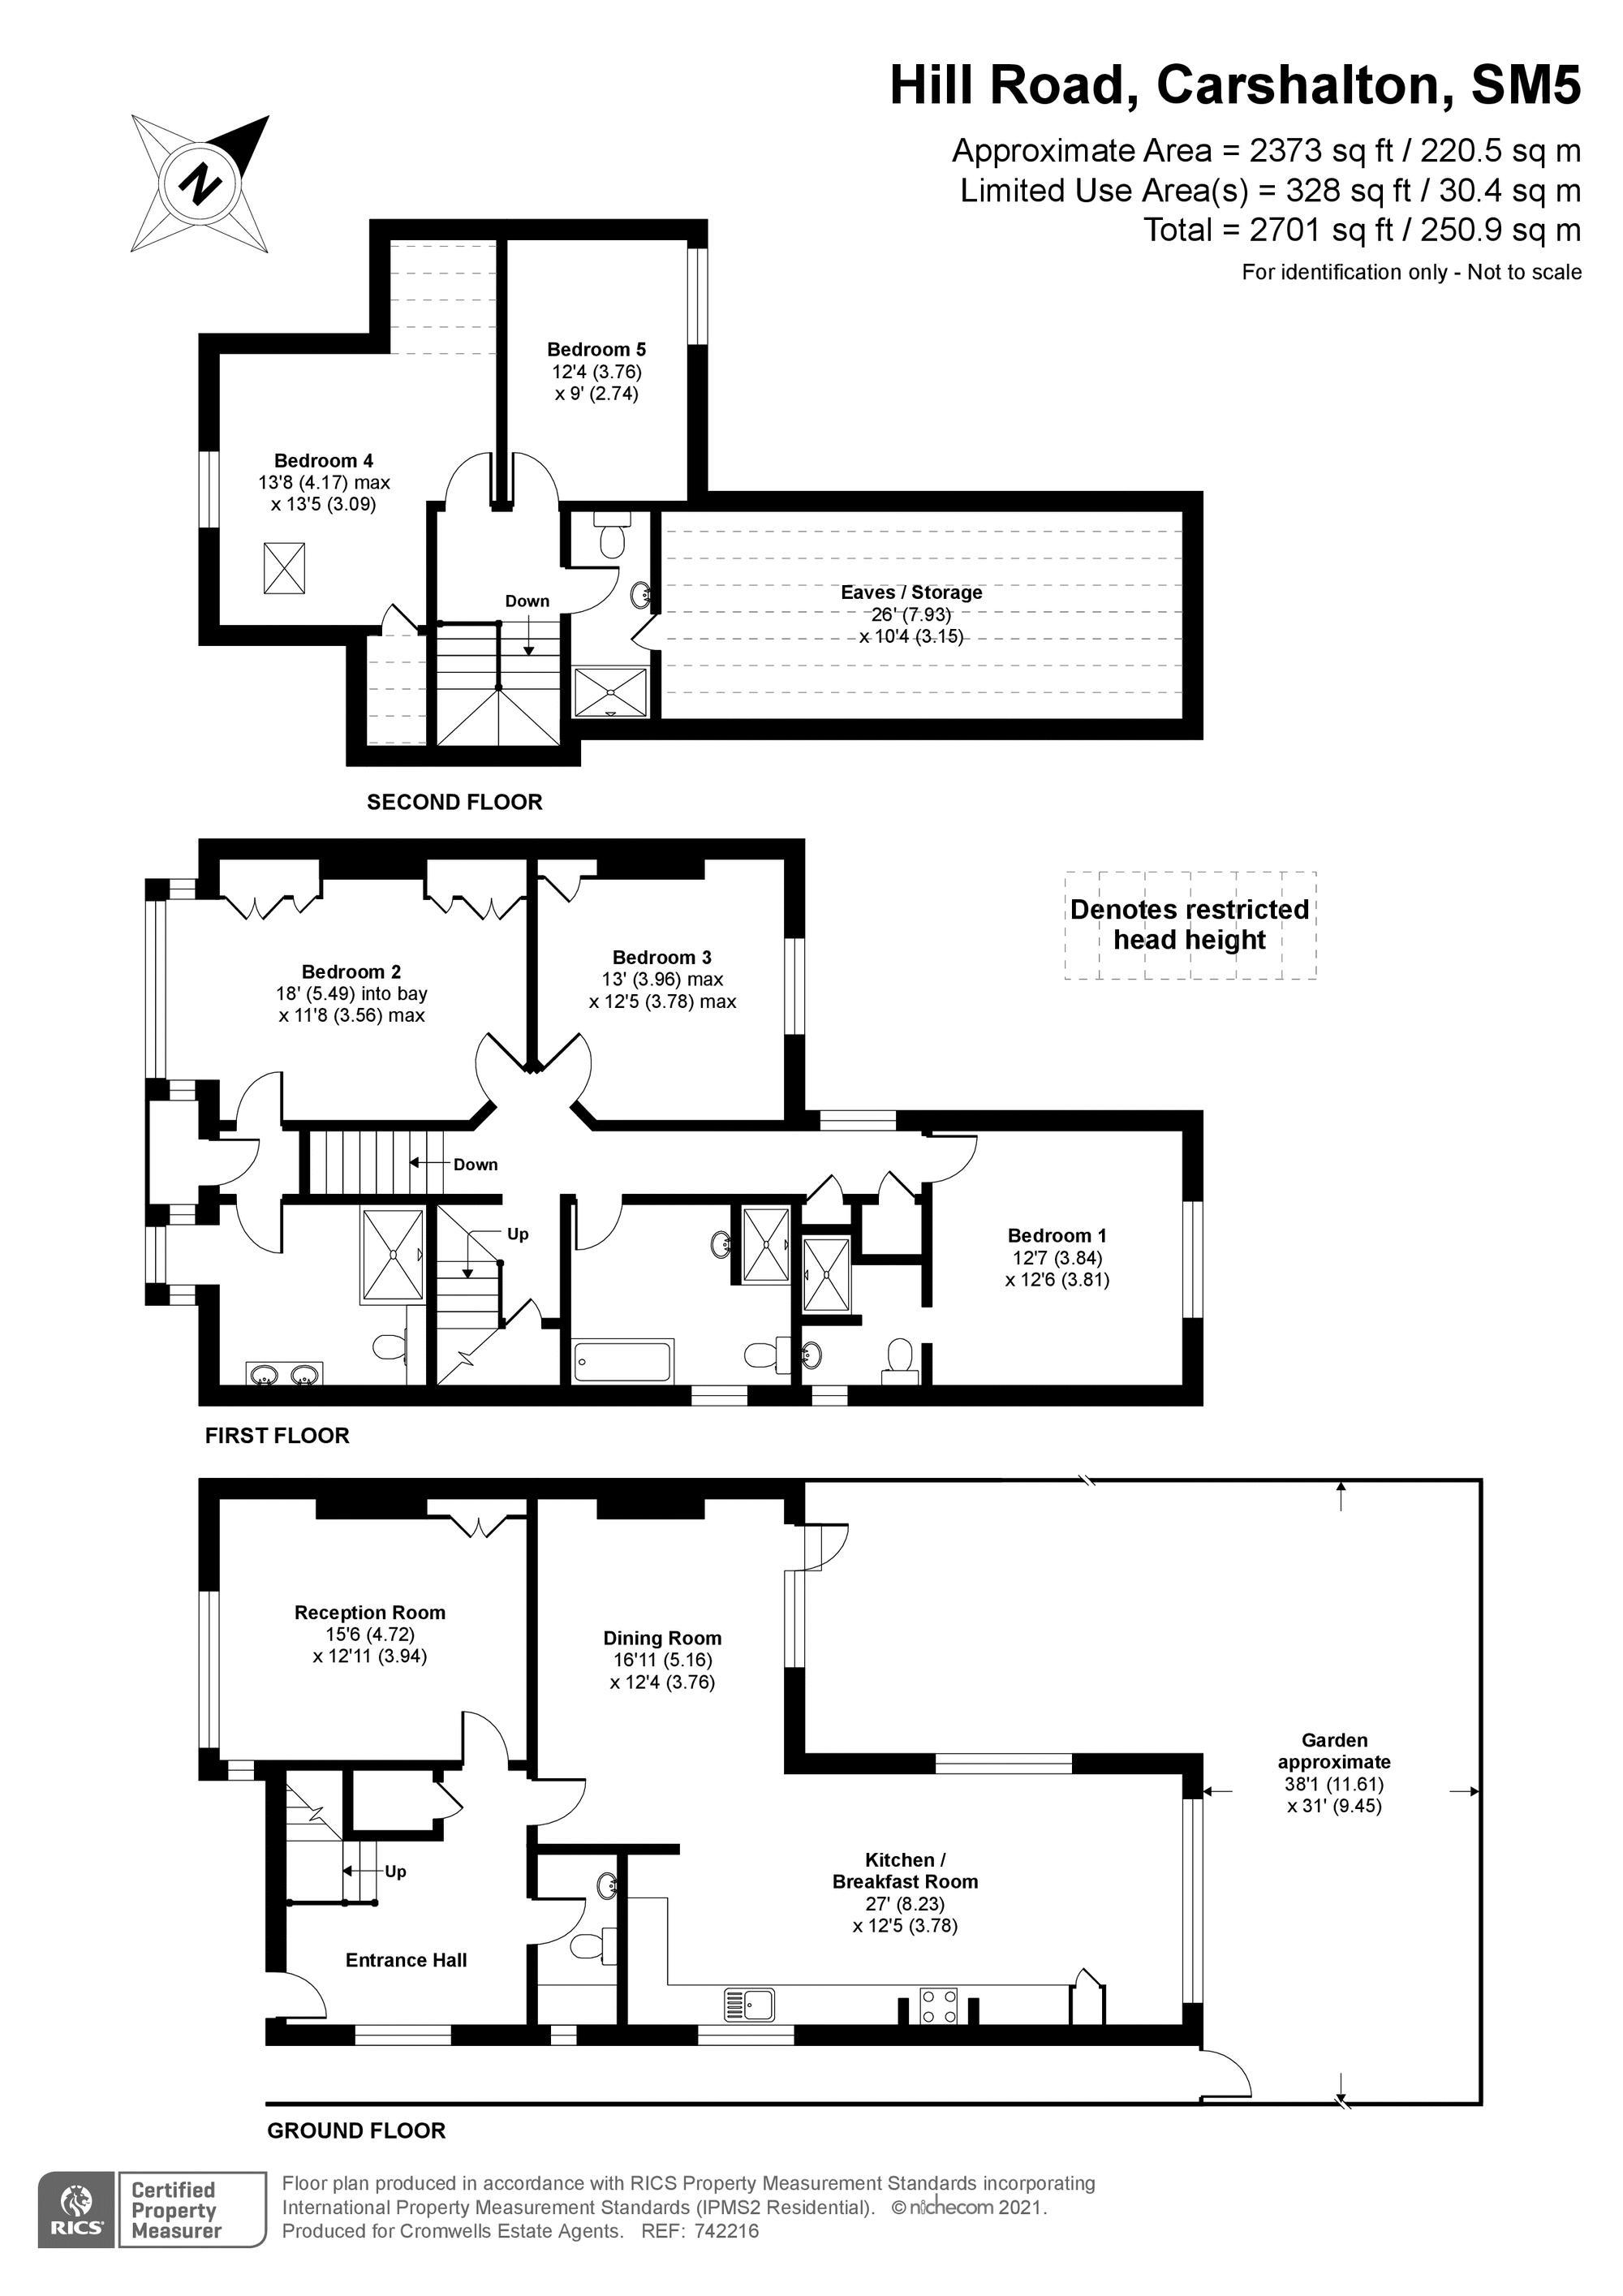 5 bedroom semi detached house SSTC in Carshalton Beeches - floorplan 1.